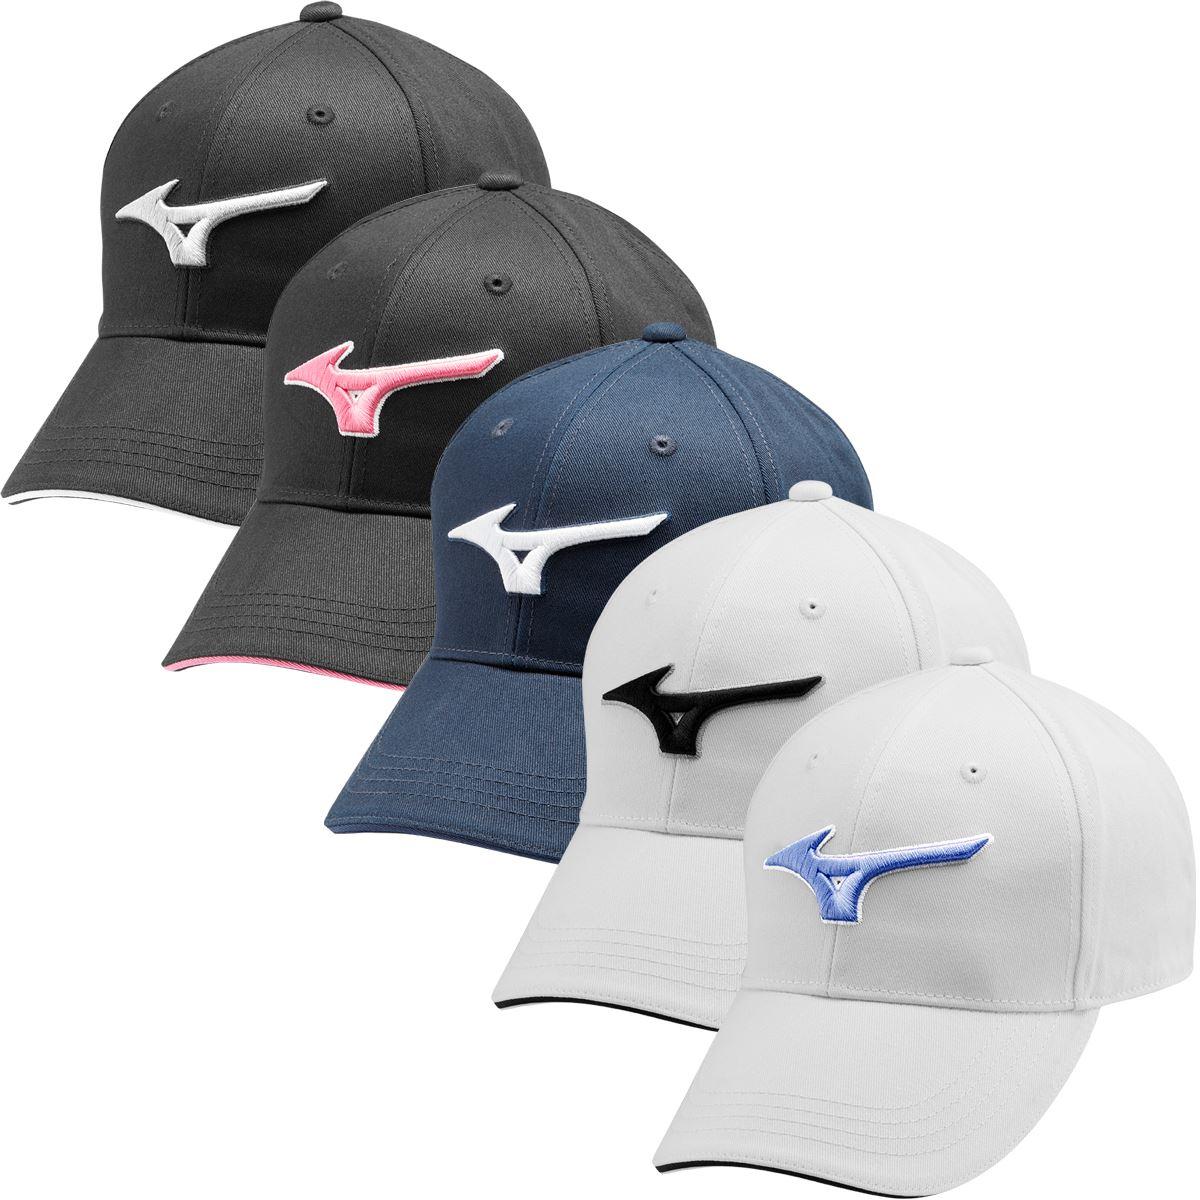 69e8f9a49 Details about Mizuno Golf 2019 Mens RB Cotton Twill Cap Adjustable  Performance Hat Golf Cap